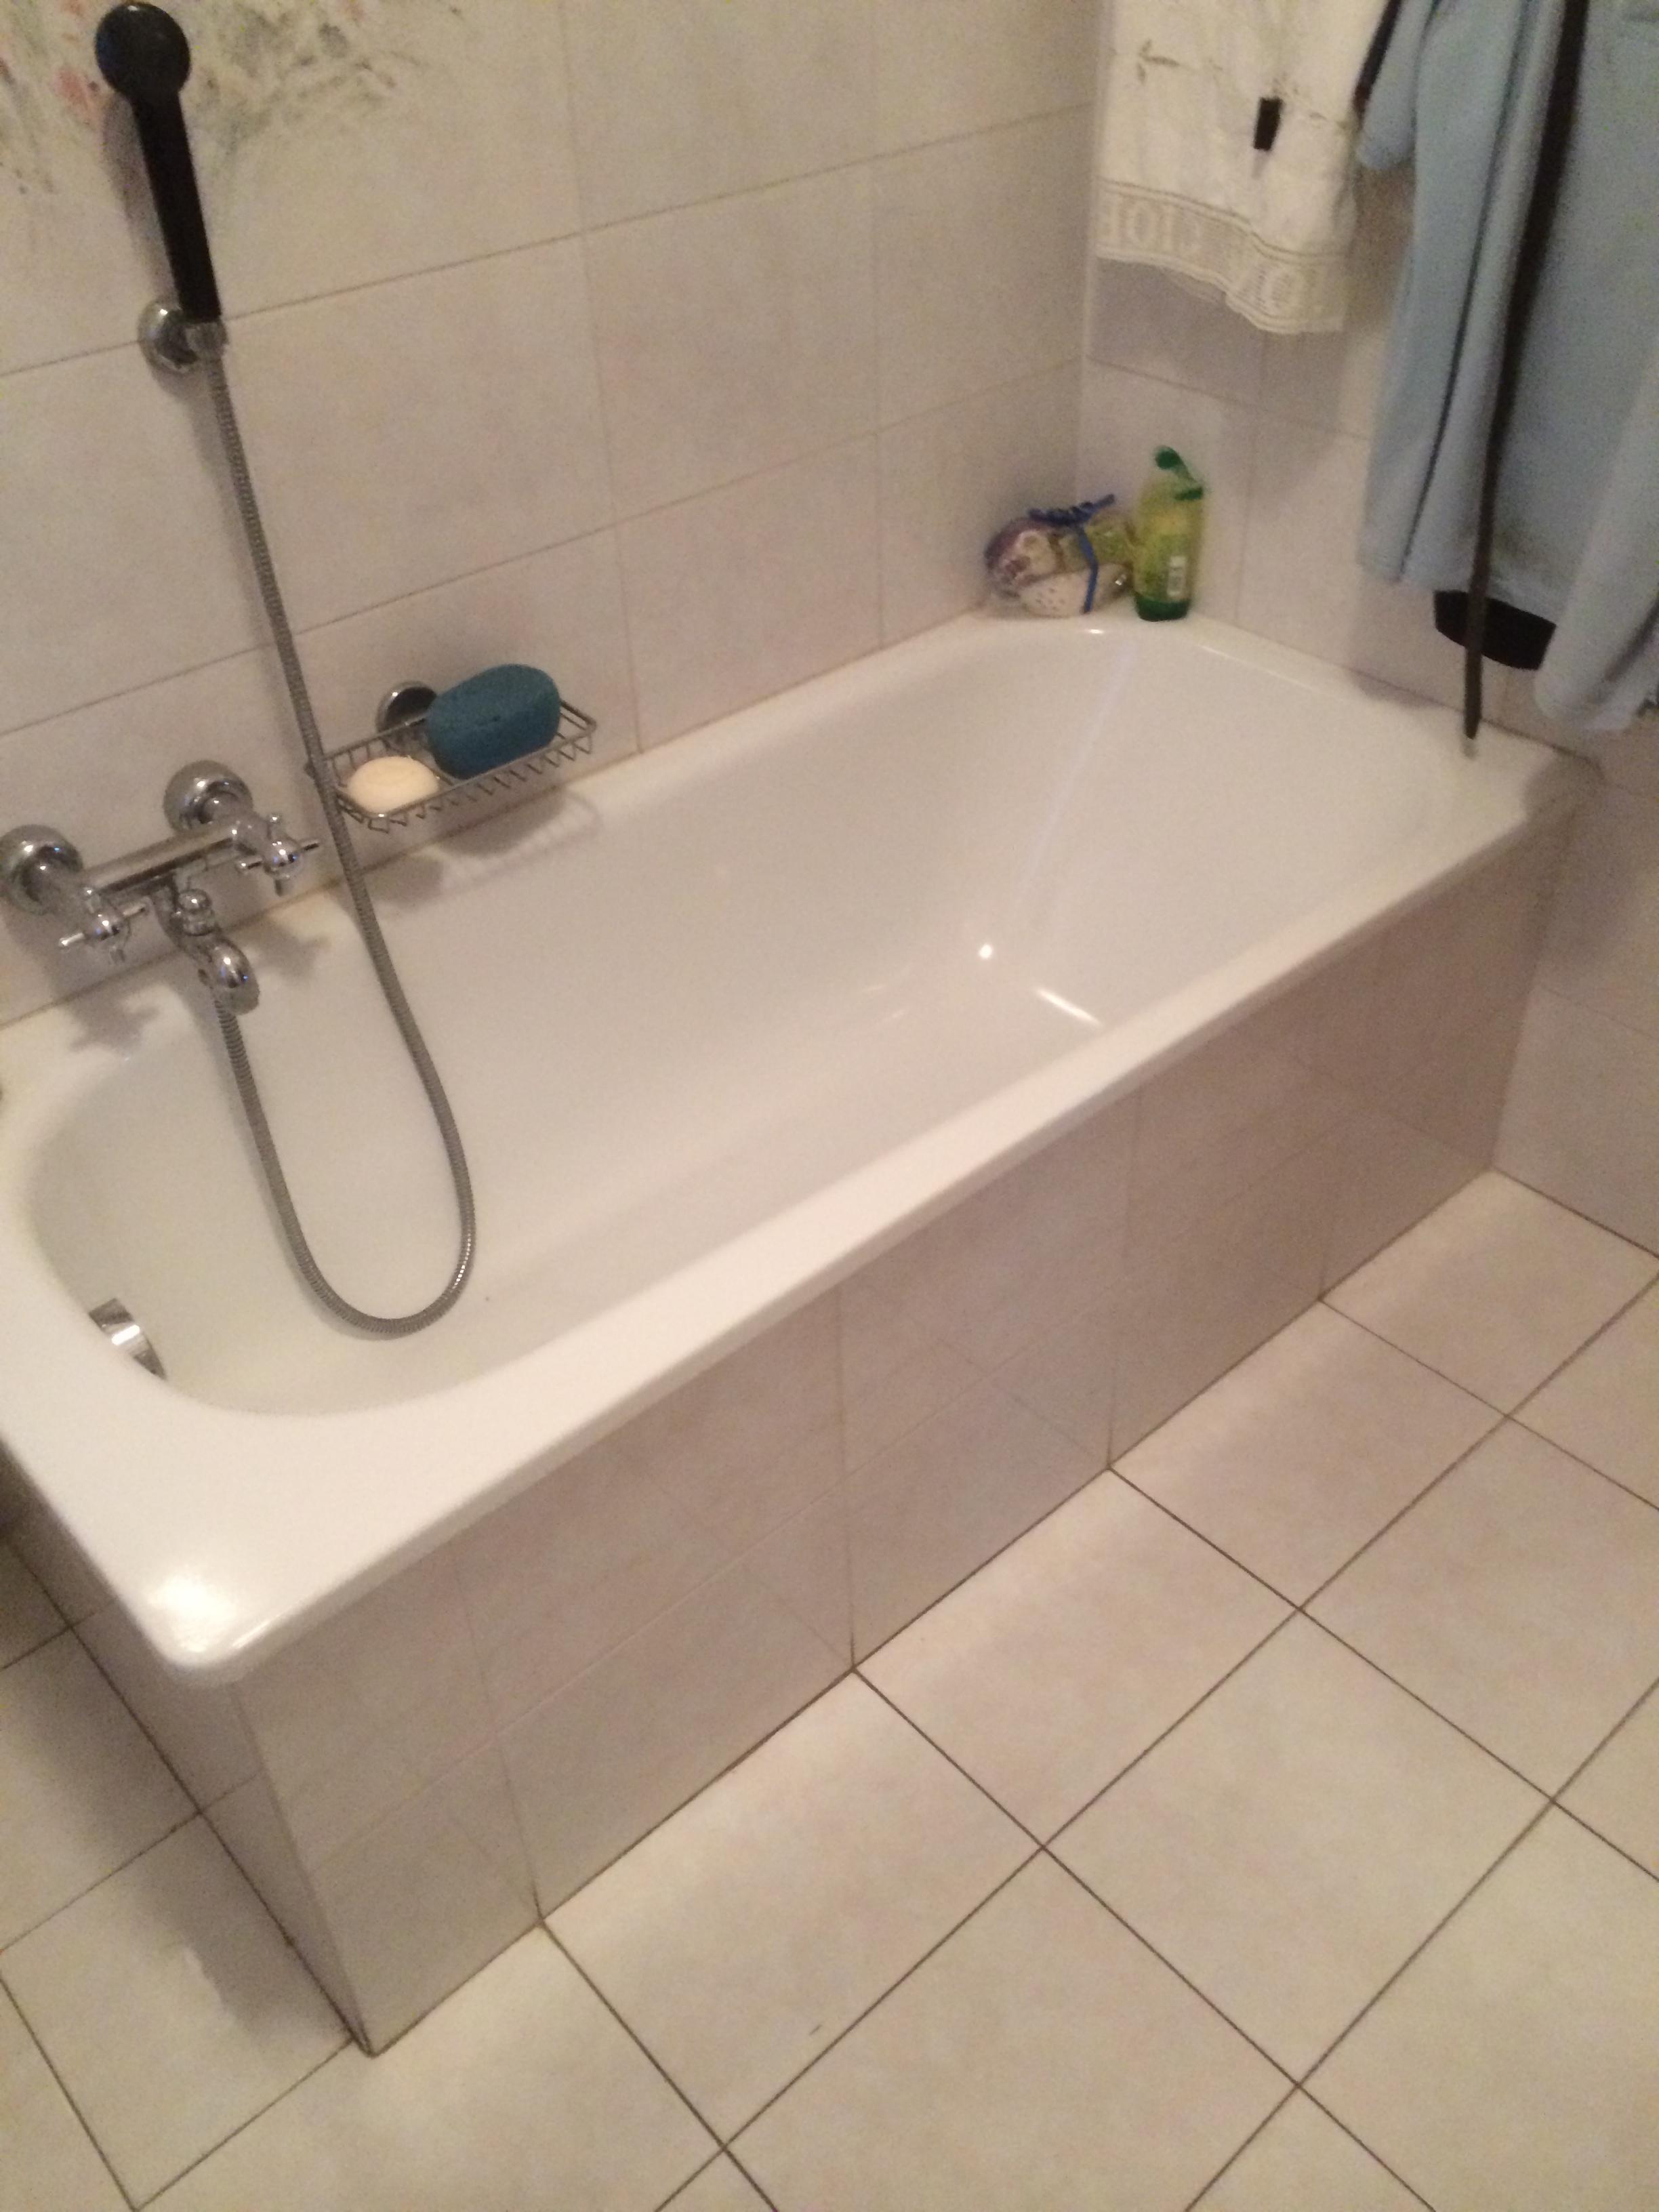 Vasca Da Bagno Filo Pavimento : Una vasca da bagno in francese trasformare una doccia in vasca